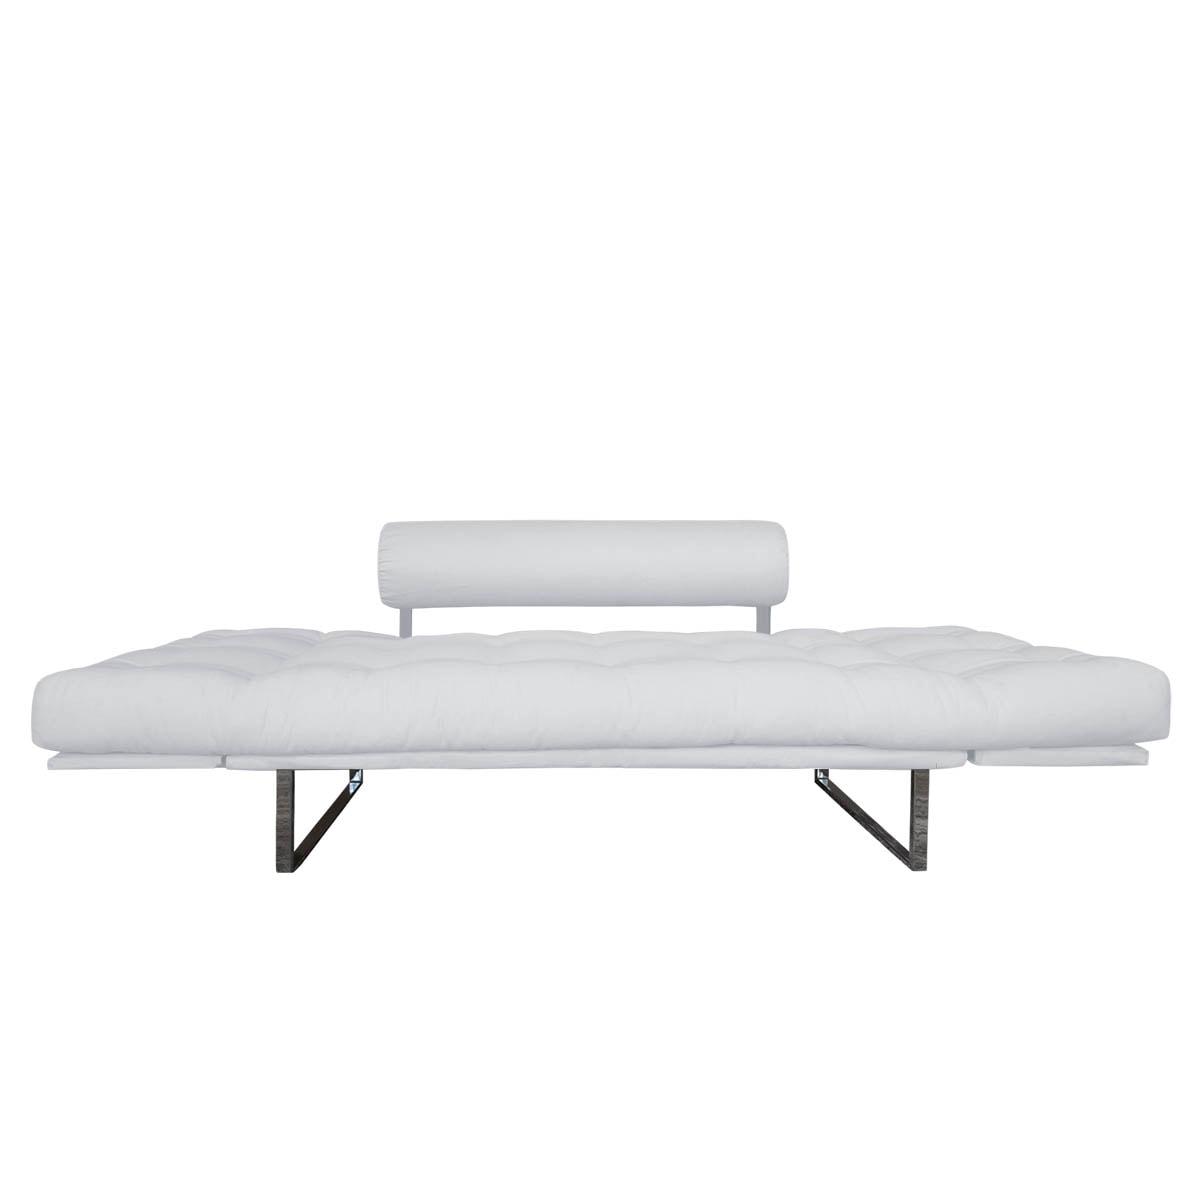 sofa cama 2 lugares futon company. Black Bedroom Furniture Sets. Home Design Ideas